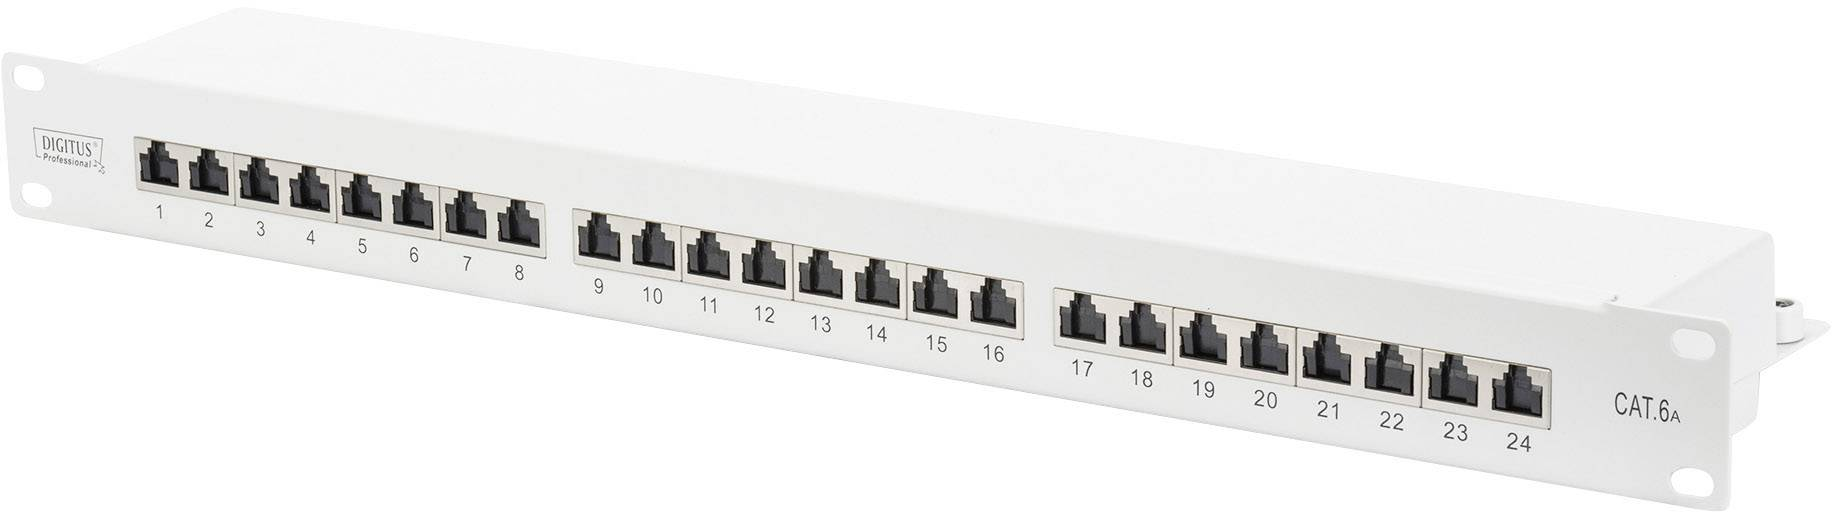 Sieťový Patchpanel Digitus Professional DN-91624S-EA, 24 portov, 1 U